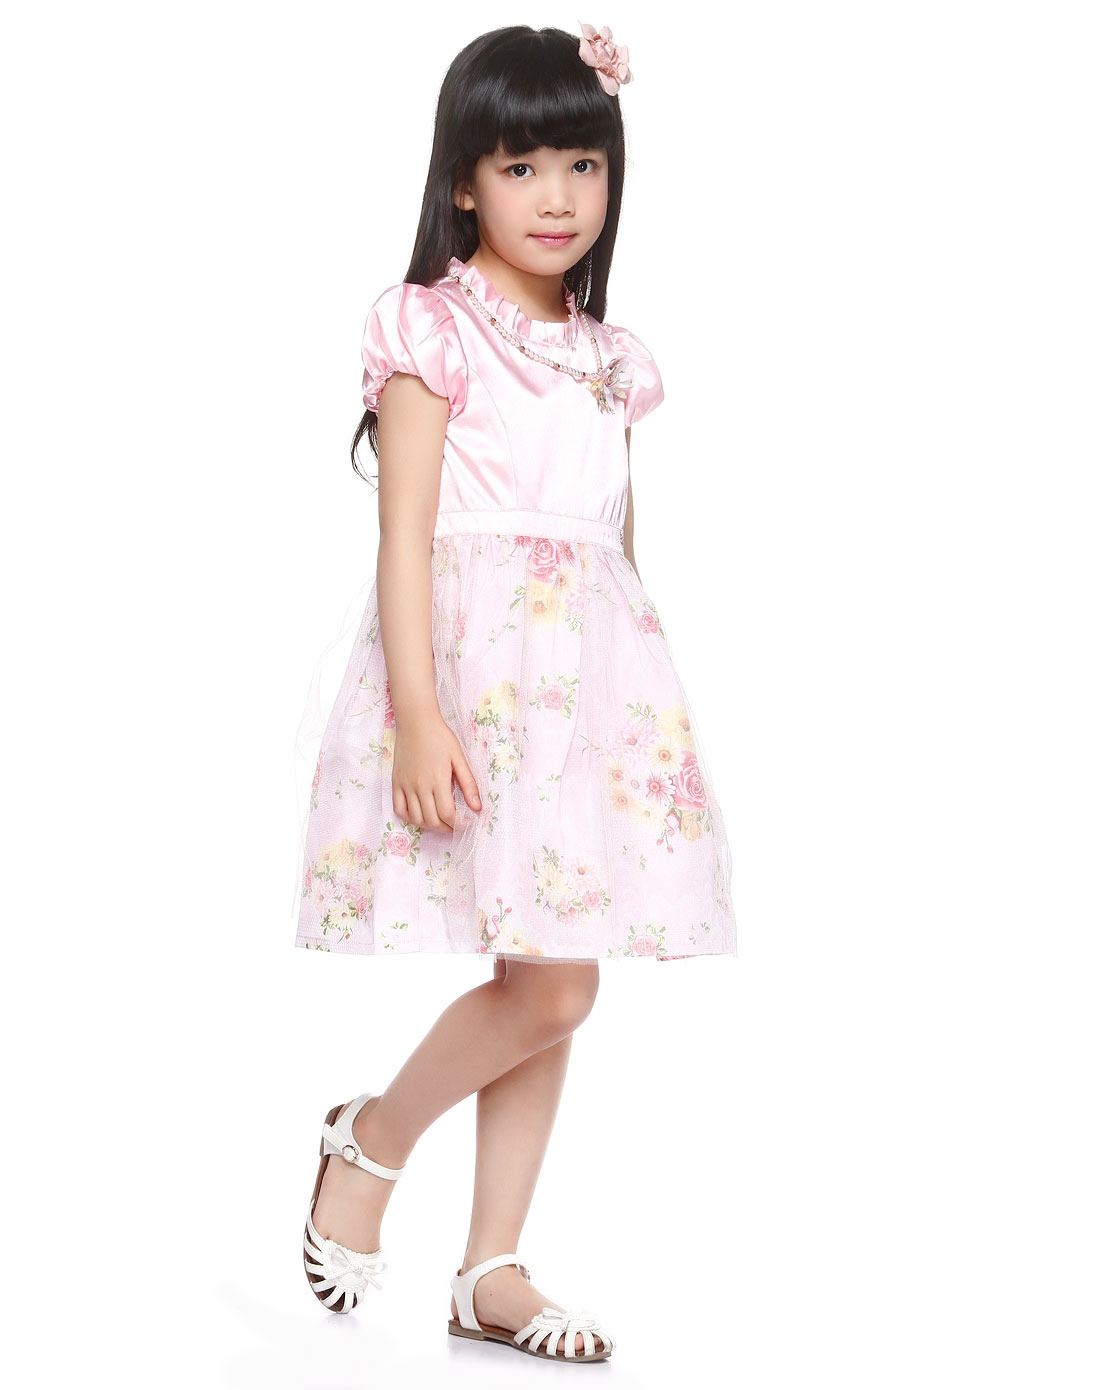 curlysue男女童女童粉红色可爱时尚短袖连衣裙shm1g44